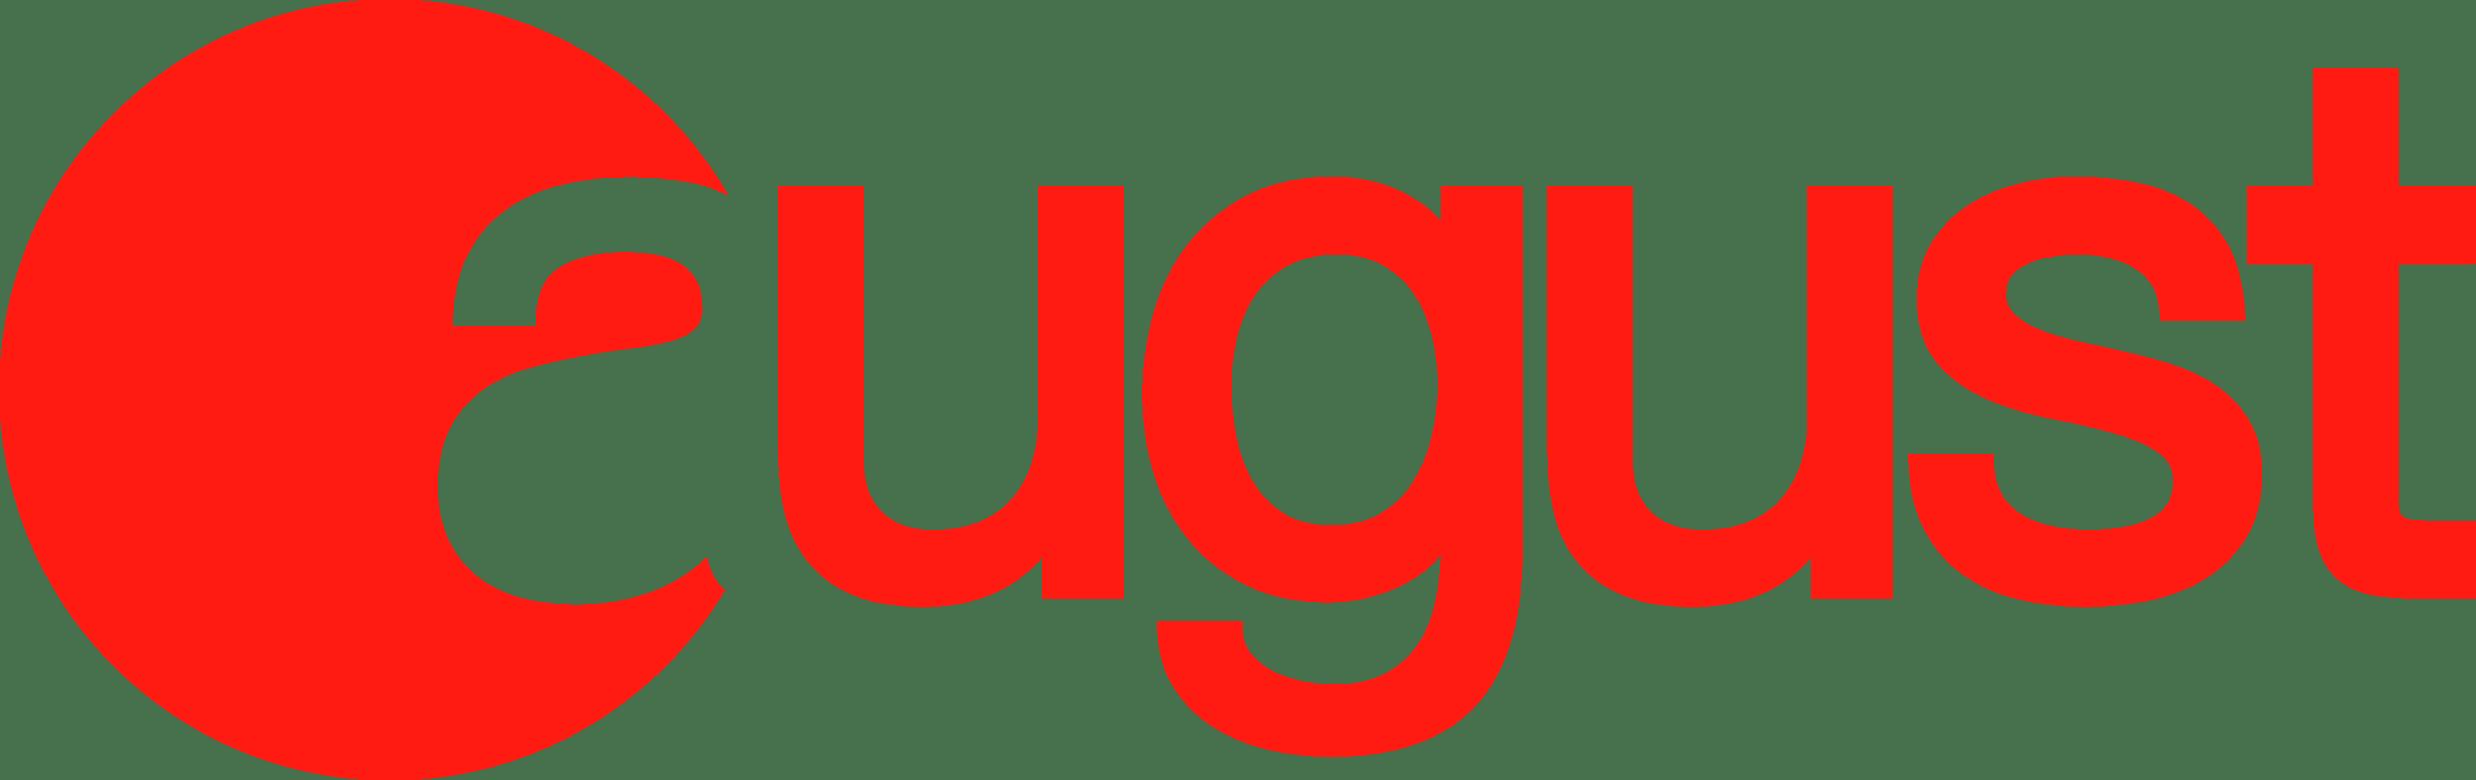 August Lock logo